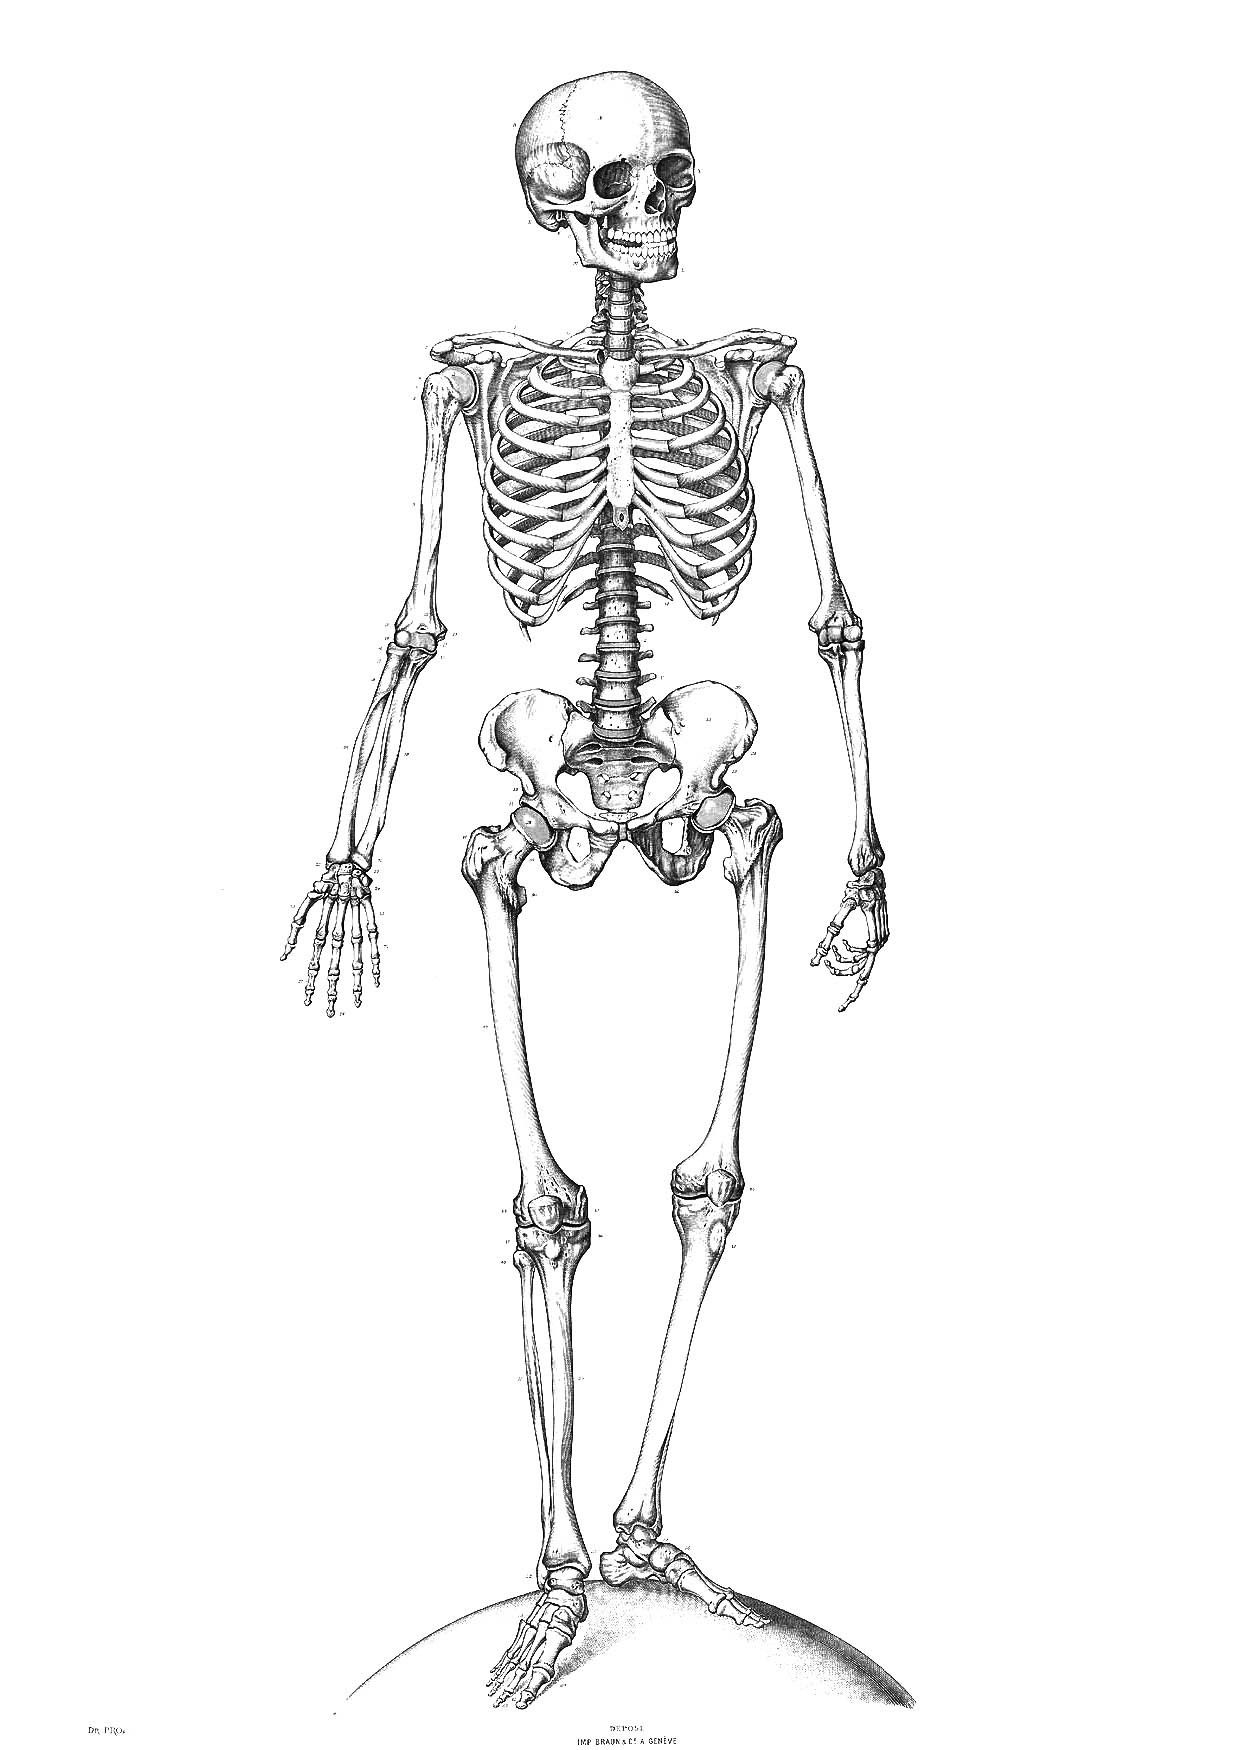 hight resolution of unlabeled human skeleton diagram unlabeled human skeleton diagram blank human skeleton diagram printable human skeleton